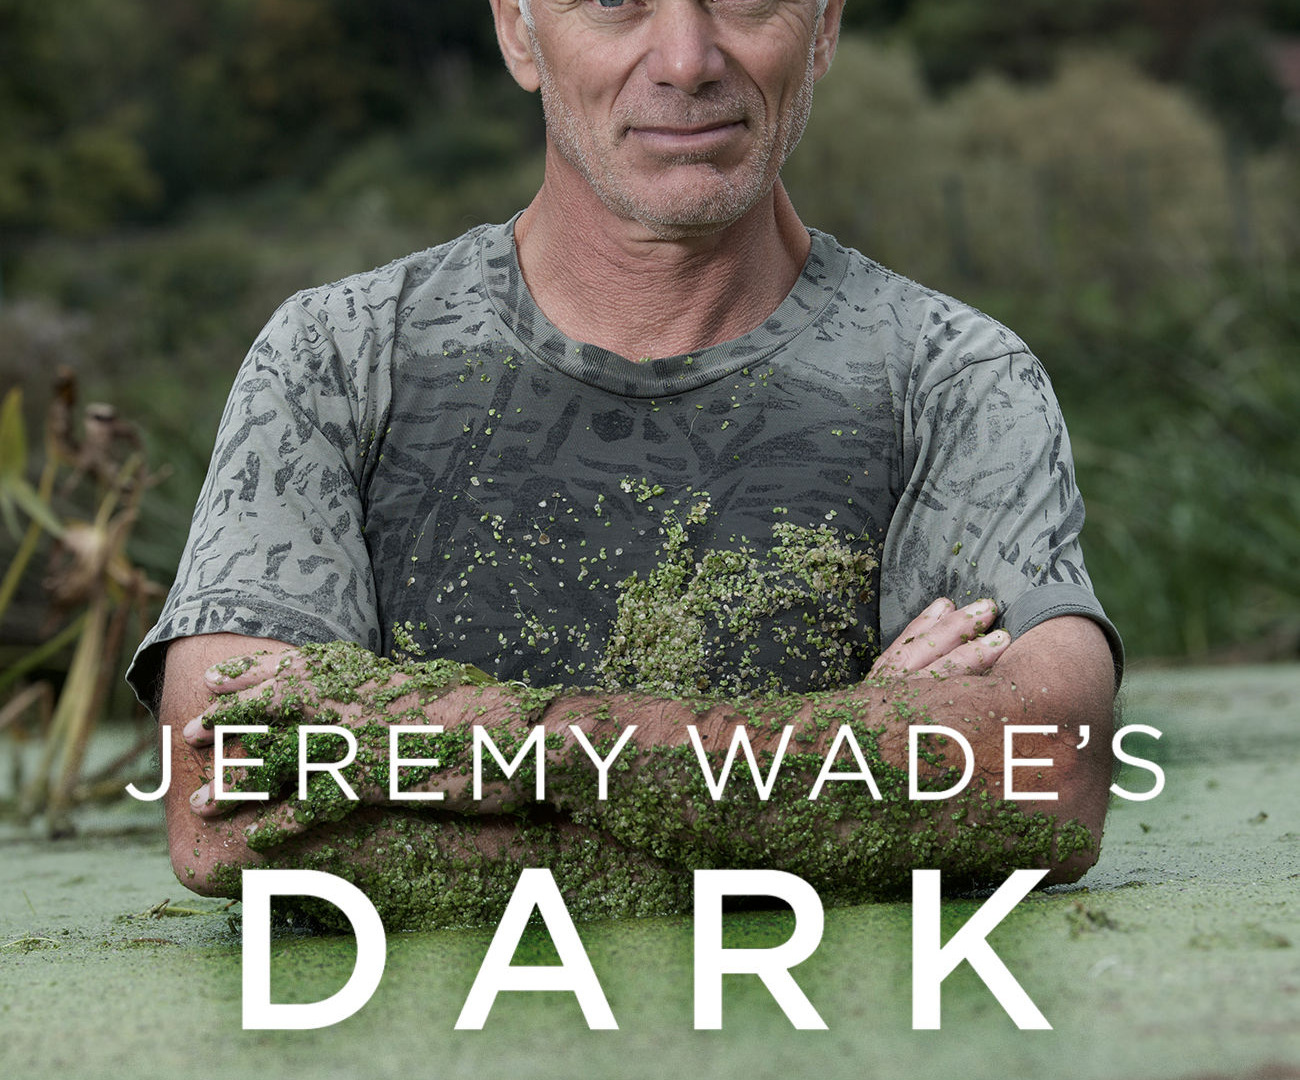 Show Jeremy Wade's Dark Waters